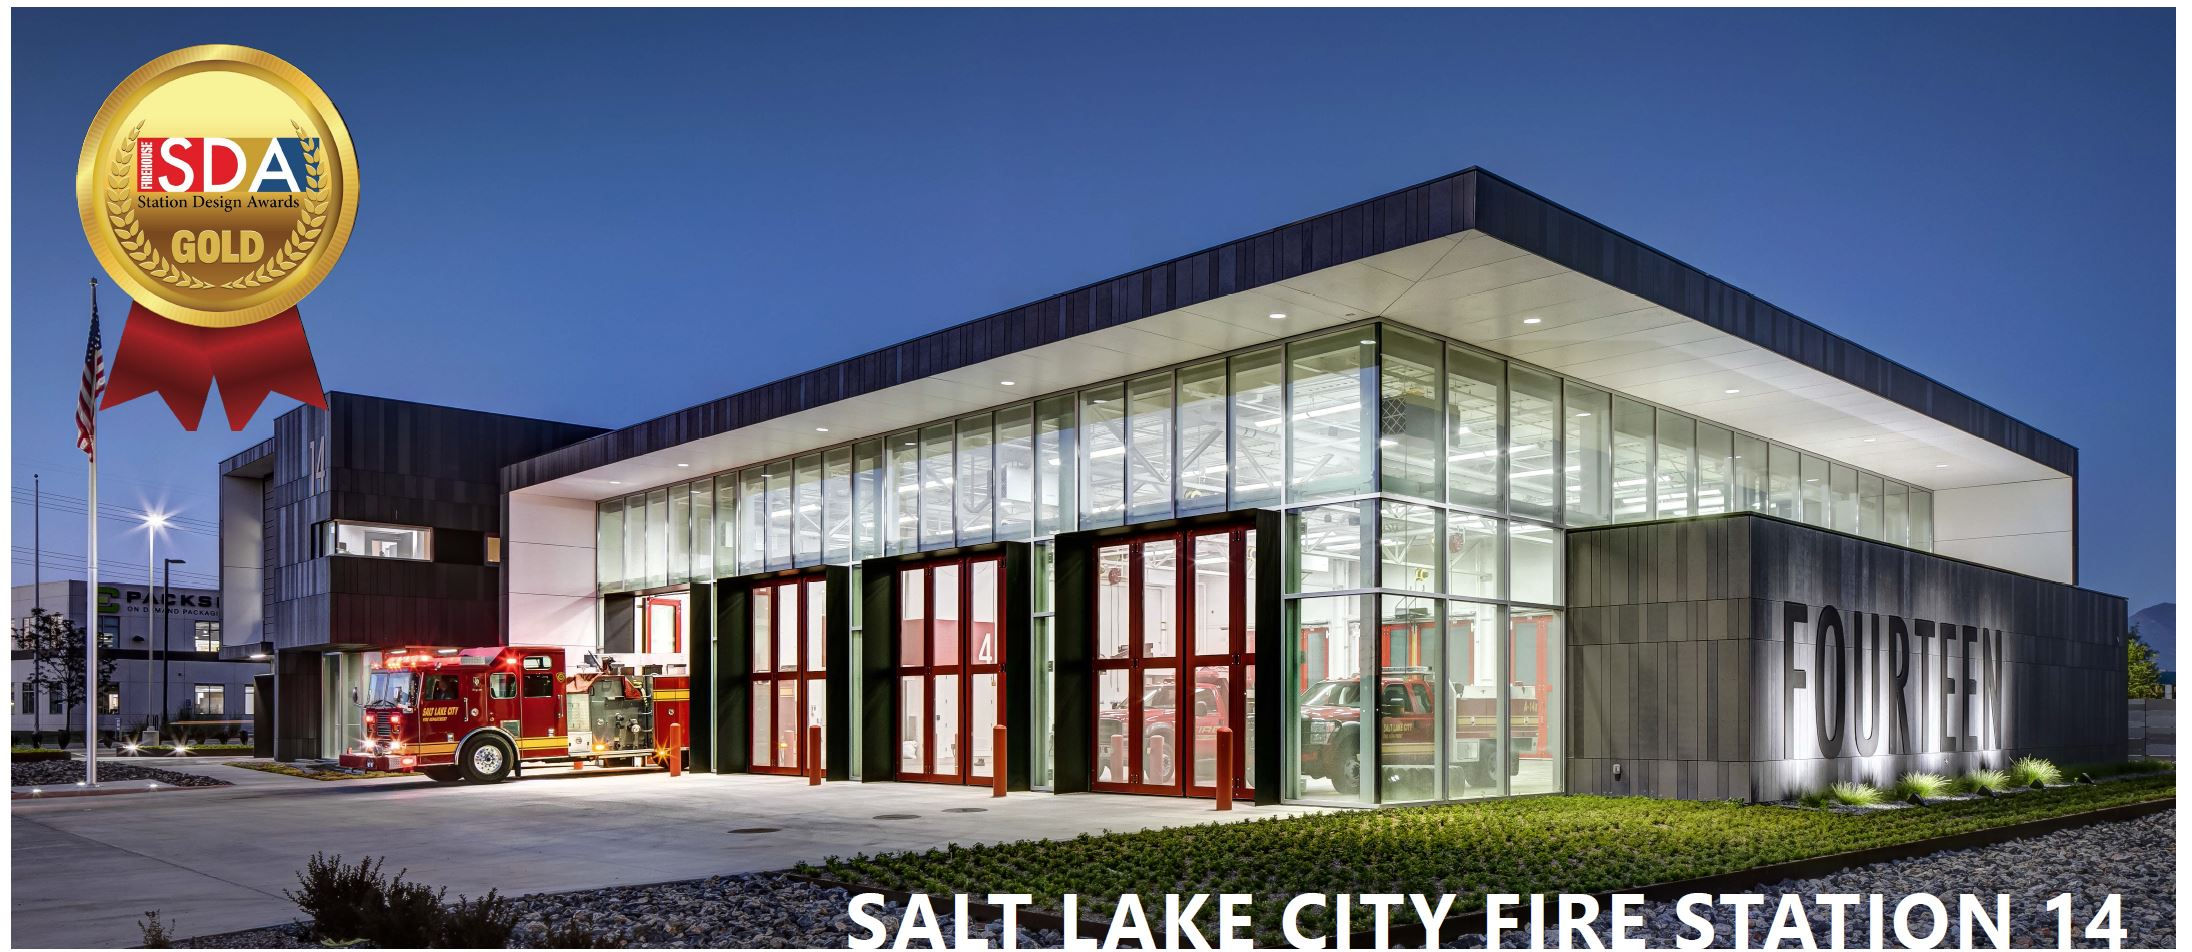 Salt Lake City Fire Station 14 Architecture